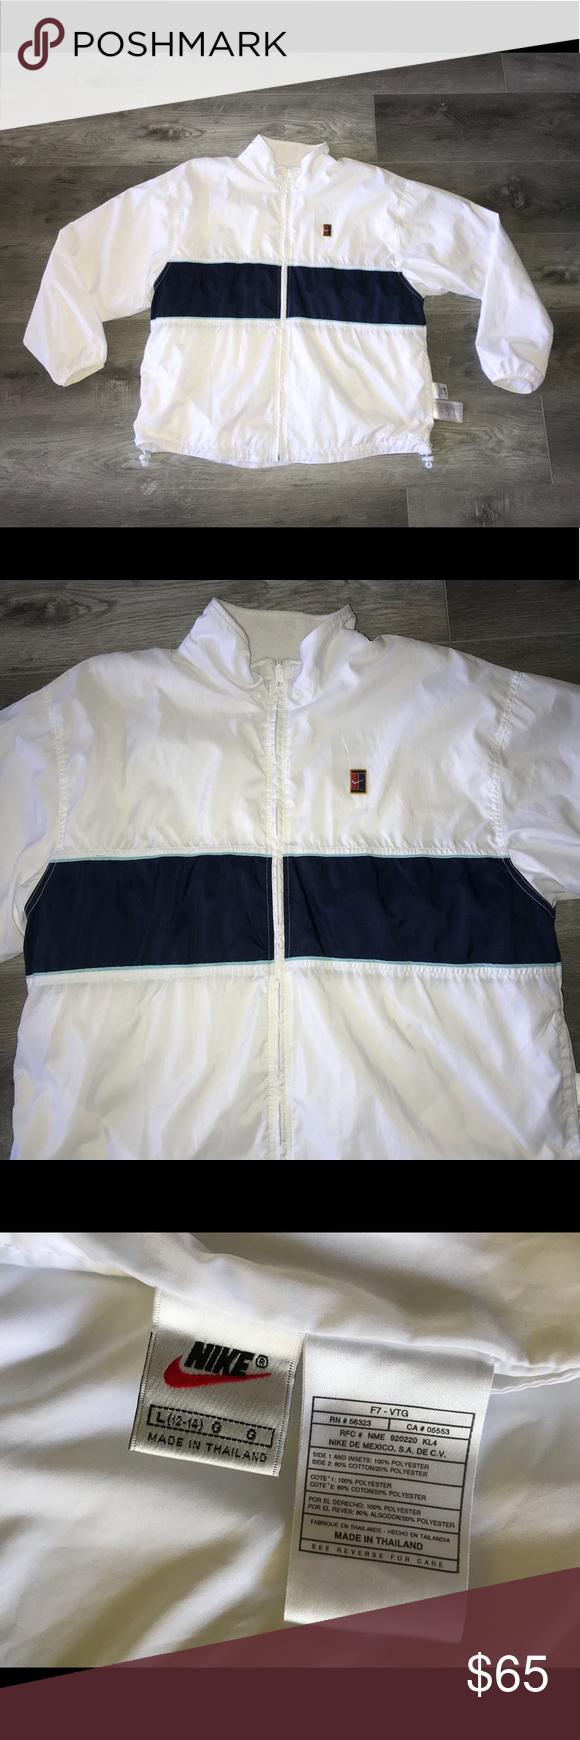 Women S Vintage 90s Nike Reversible Tennis Jacket Nike Women Jackets